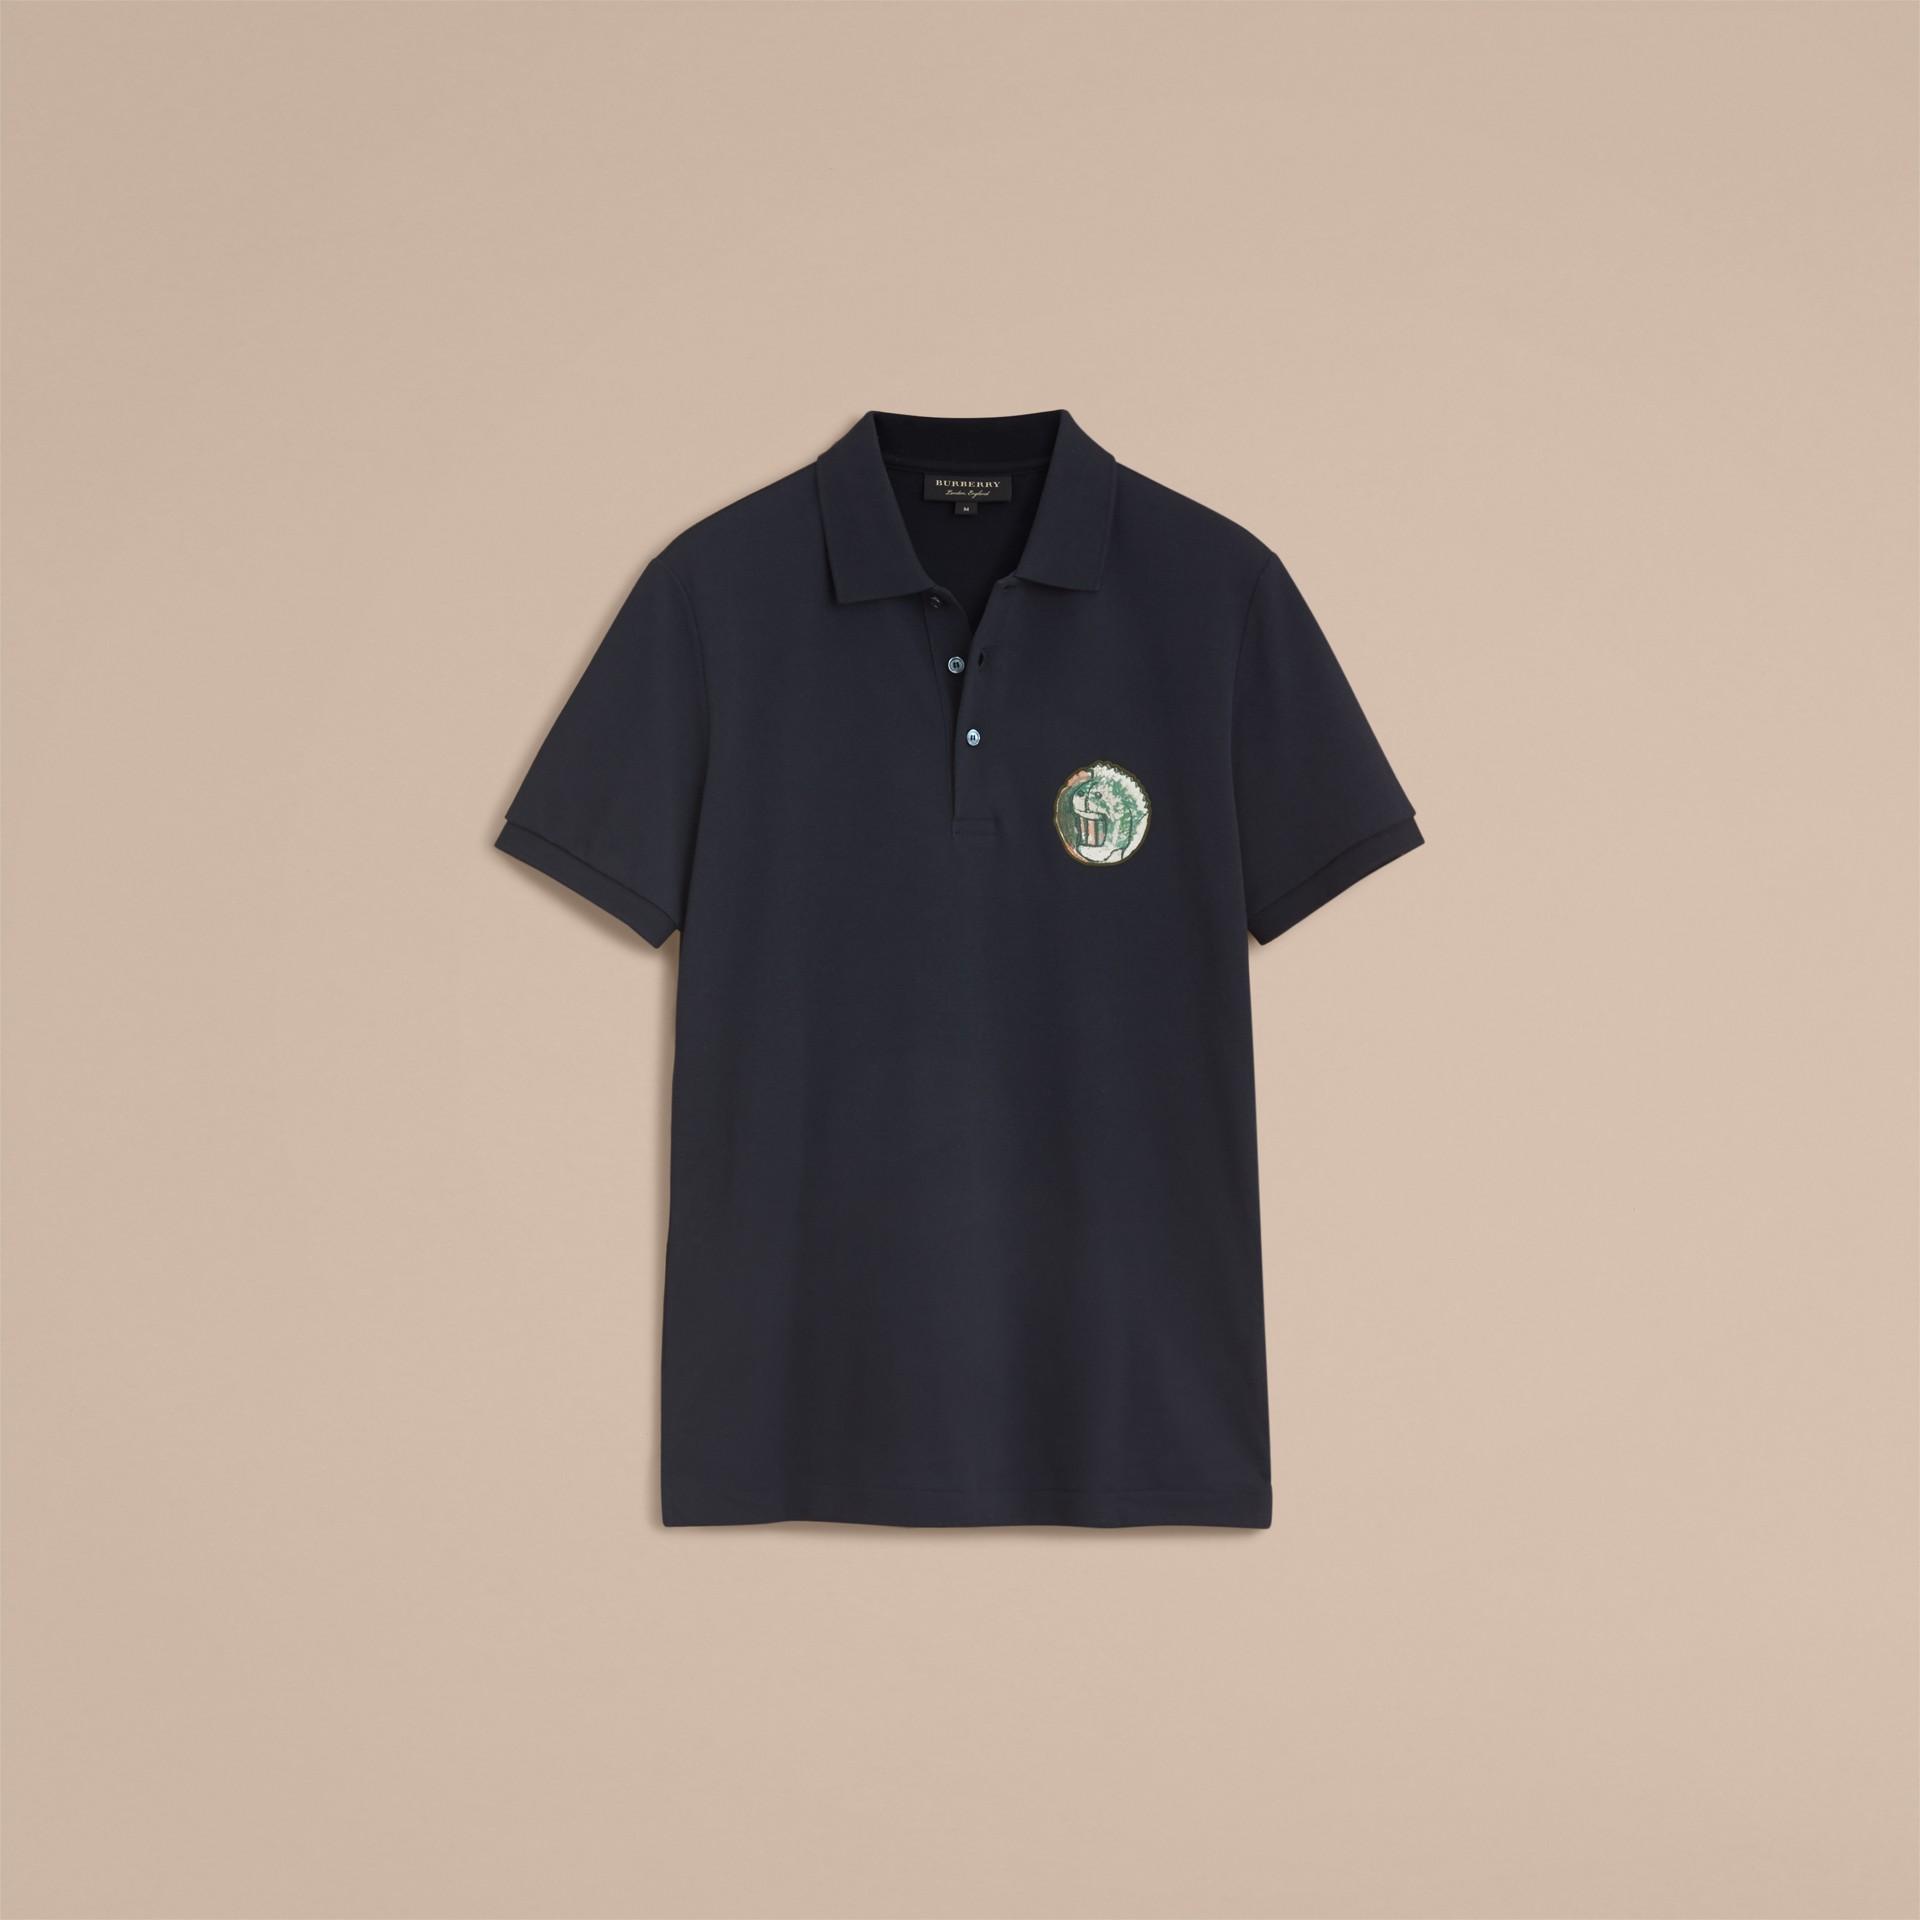 Pallas Heads Appliqué Cotton Polo Shirt in Dark Navy - gallery image 4